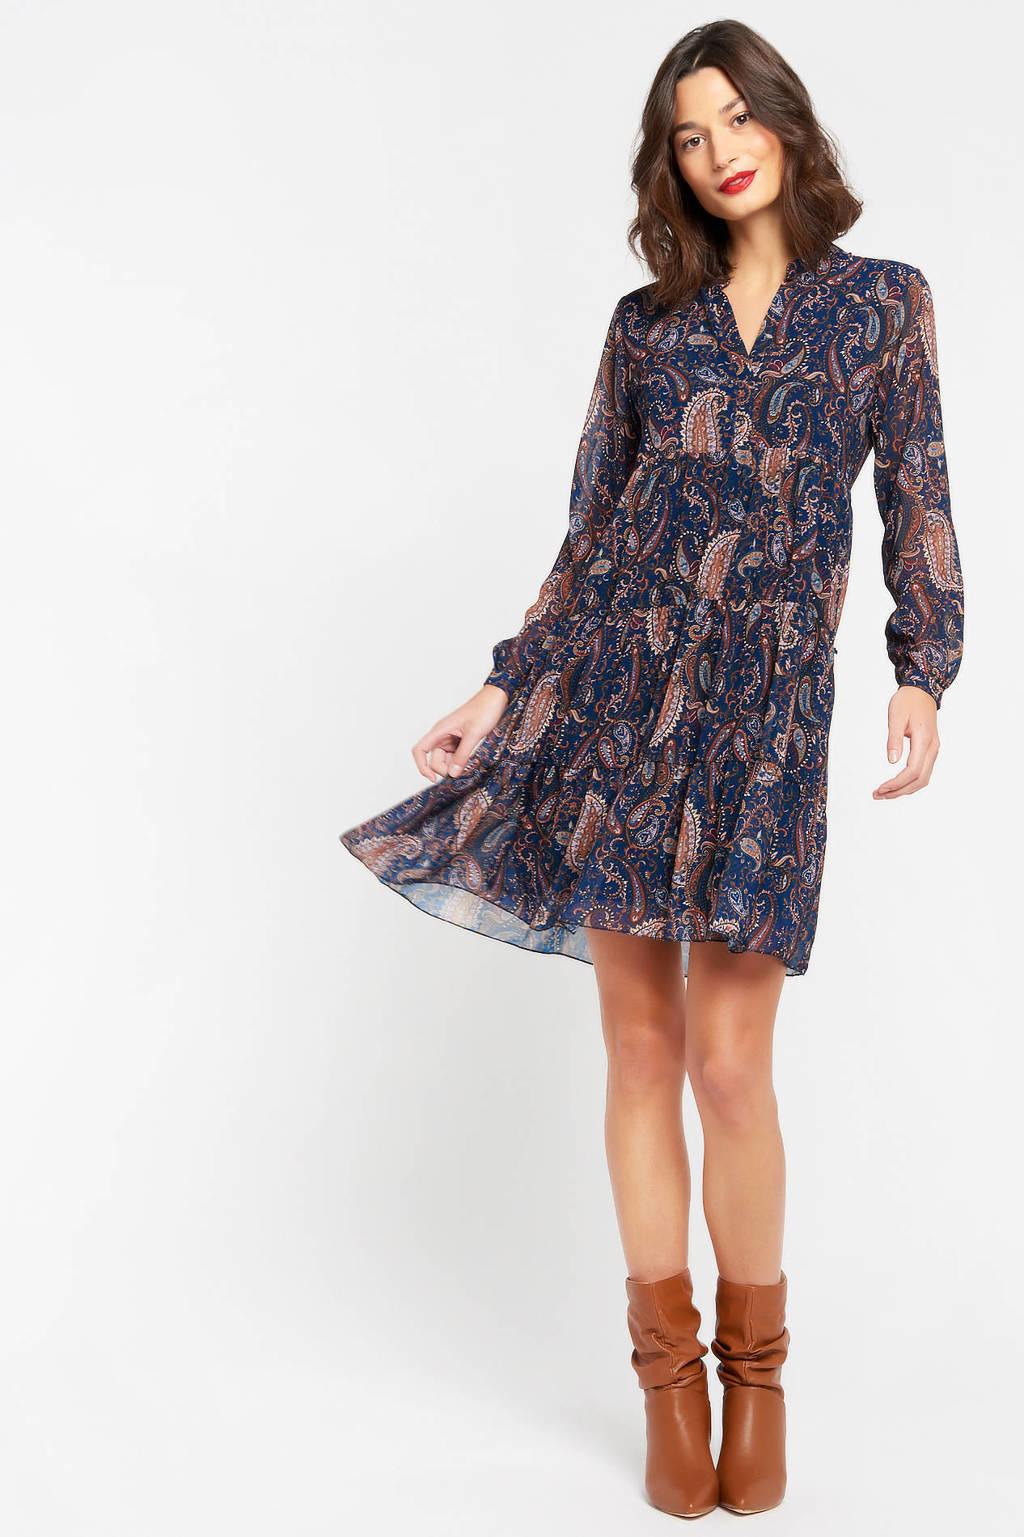 LOLALIZA jurk met paisleyprint donkerblauw, Donkerblauw/rood